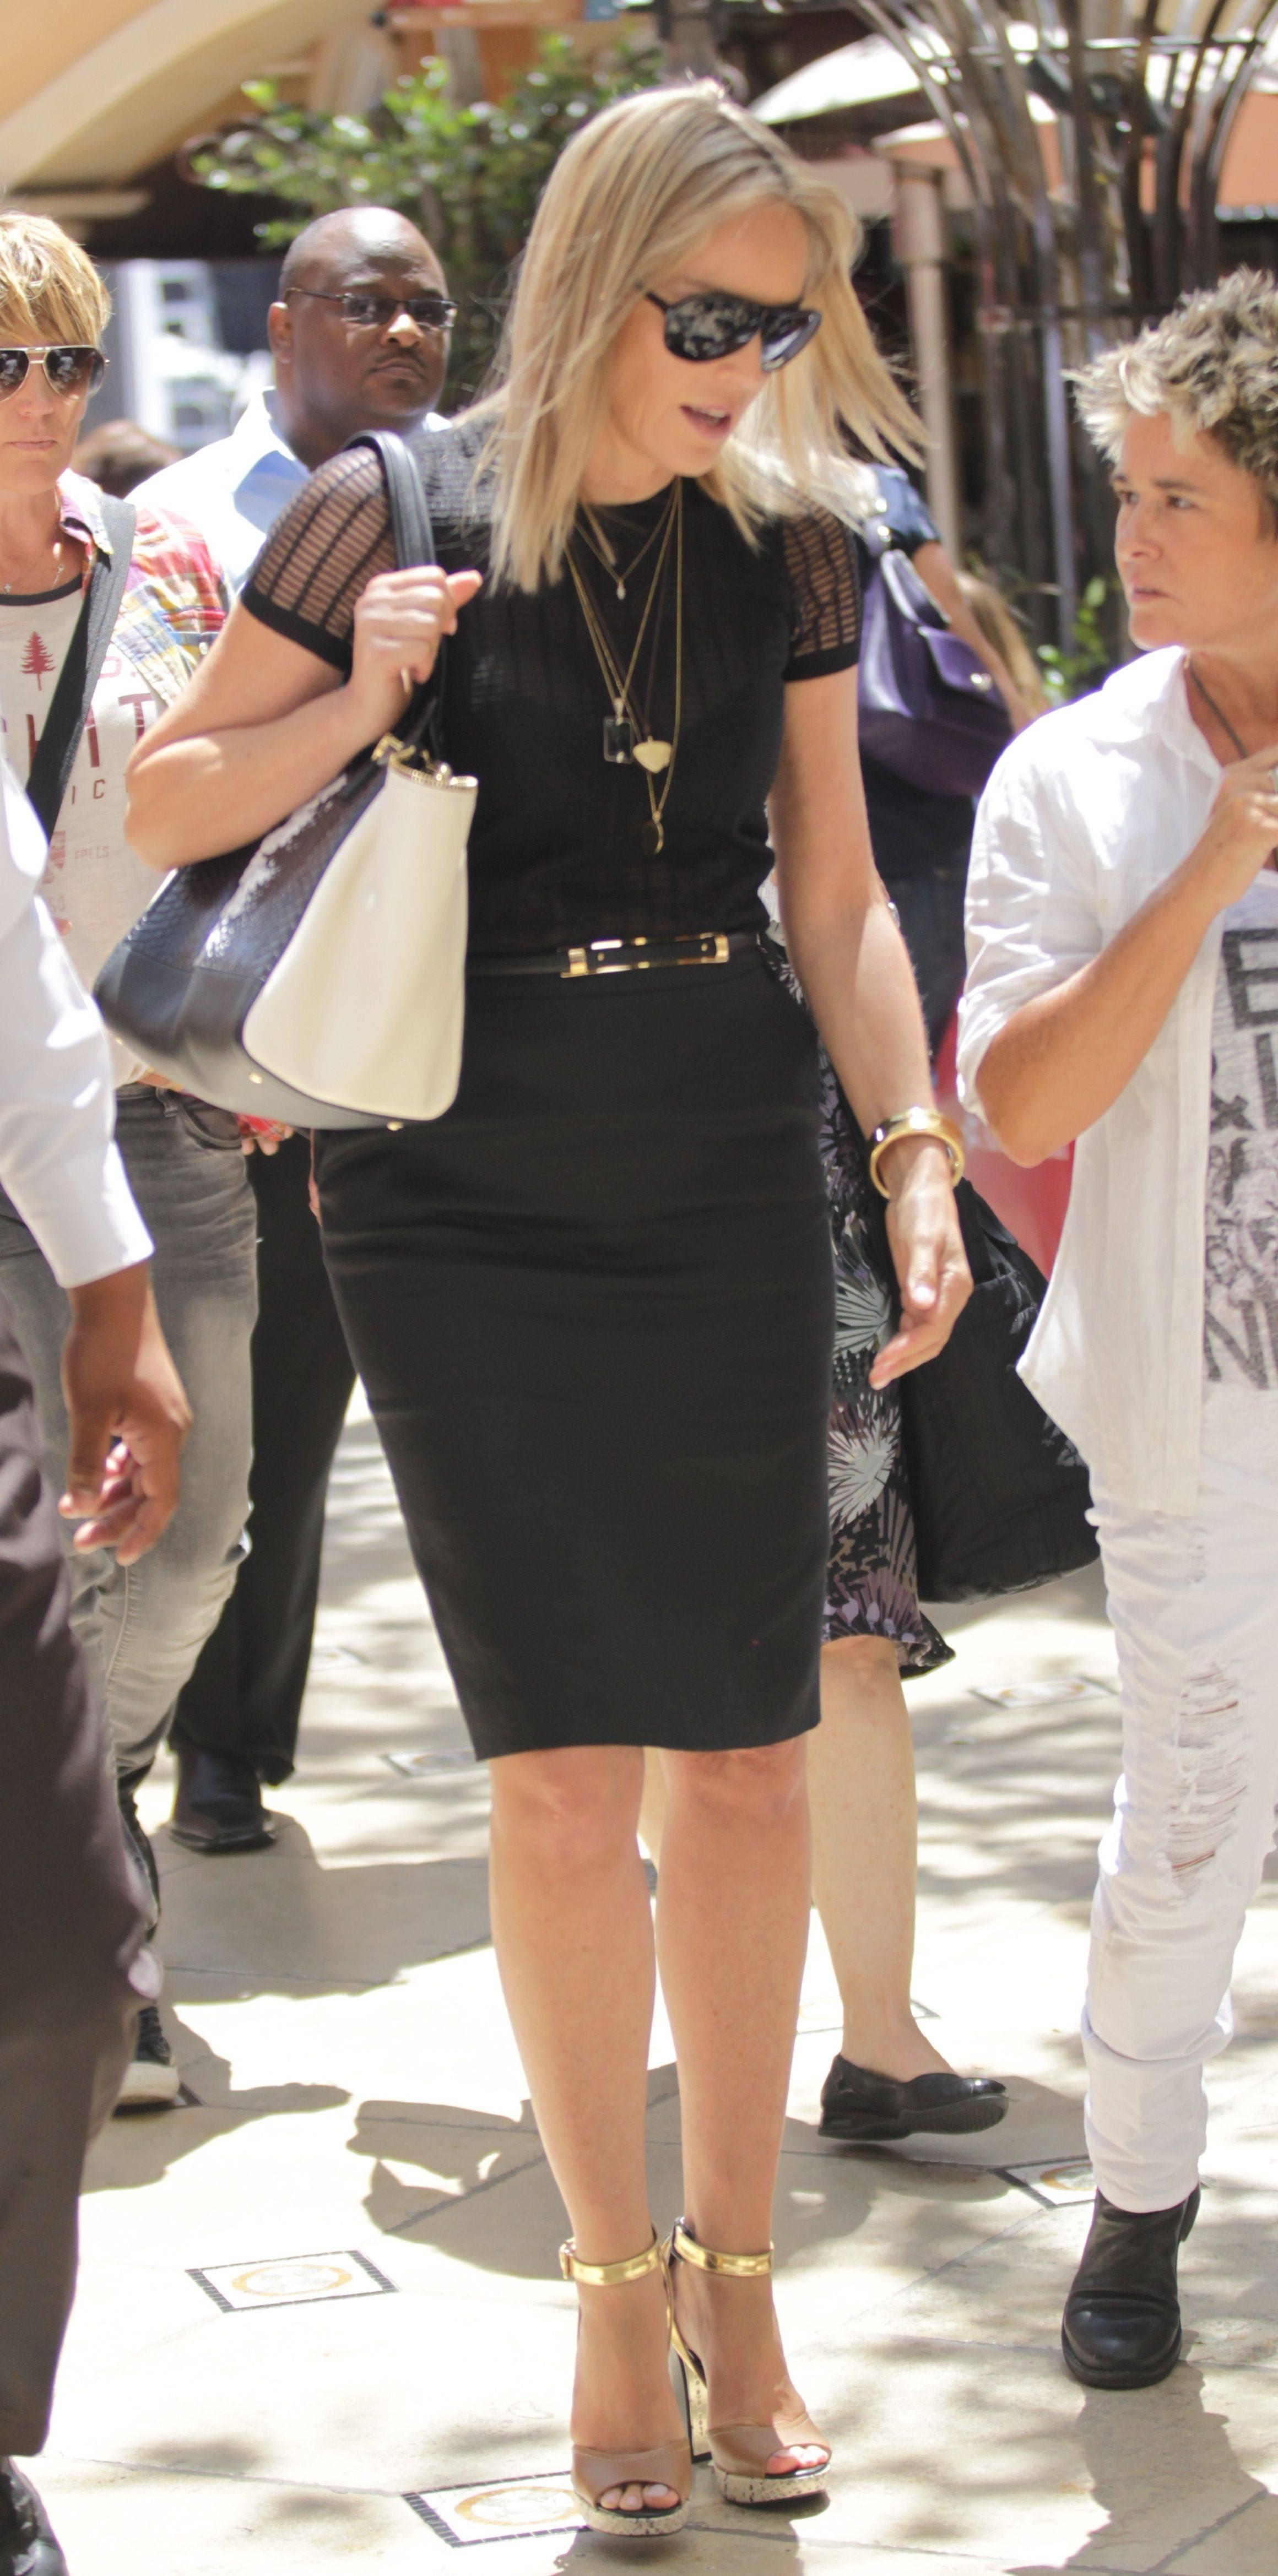 Bags & Handbag Trends : RARE Ferragamo Lucite Purse ...